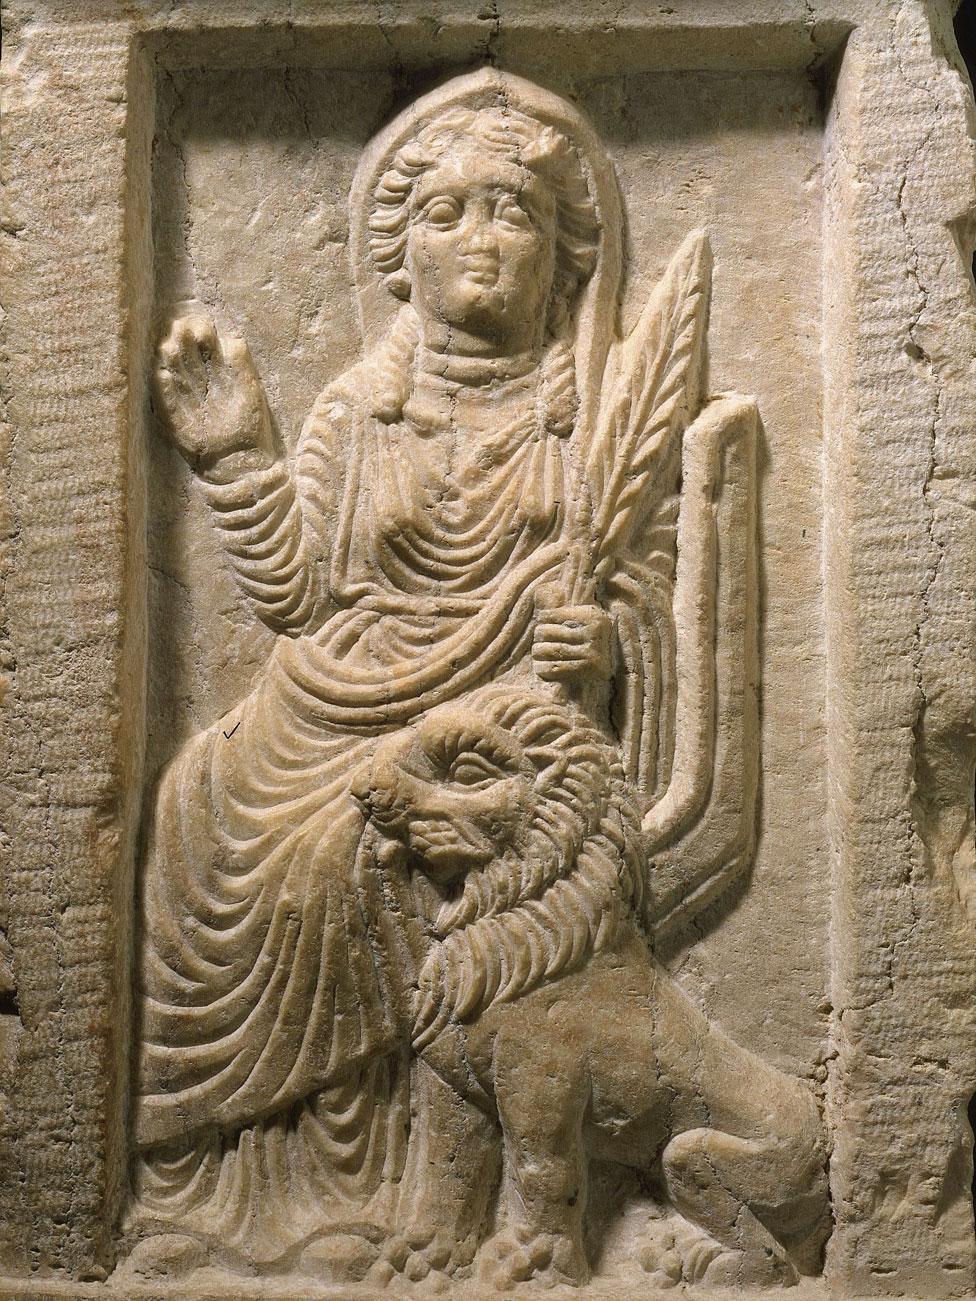 The goddess al-Lat